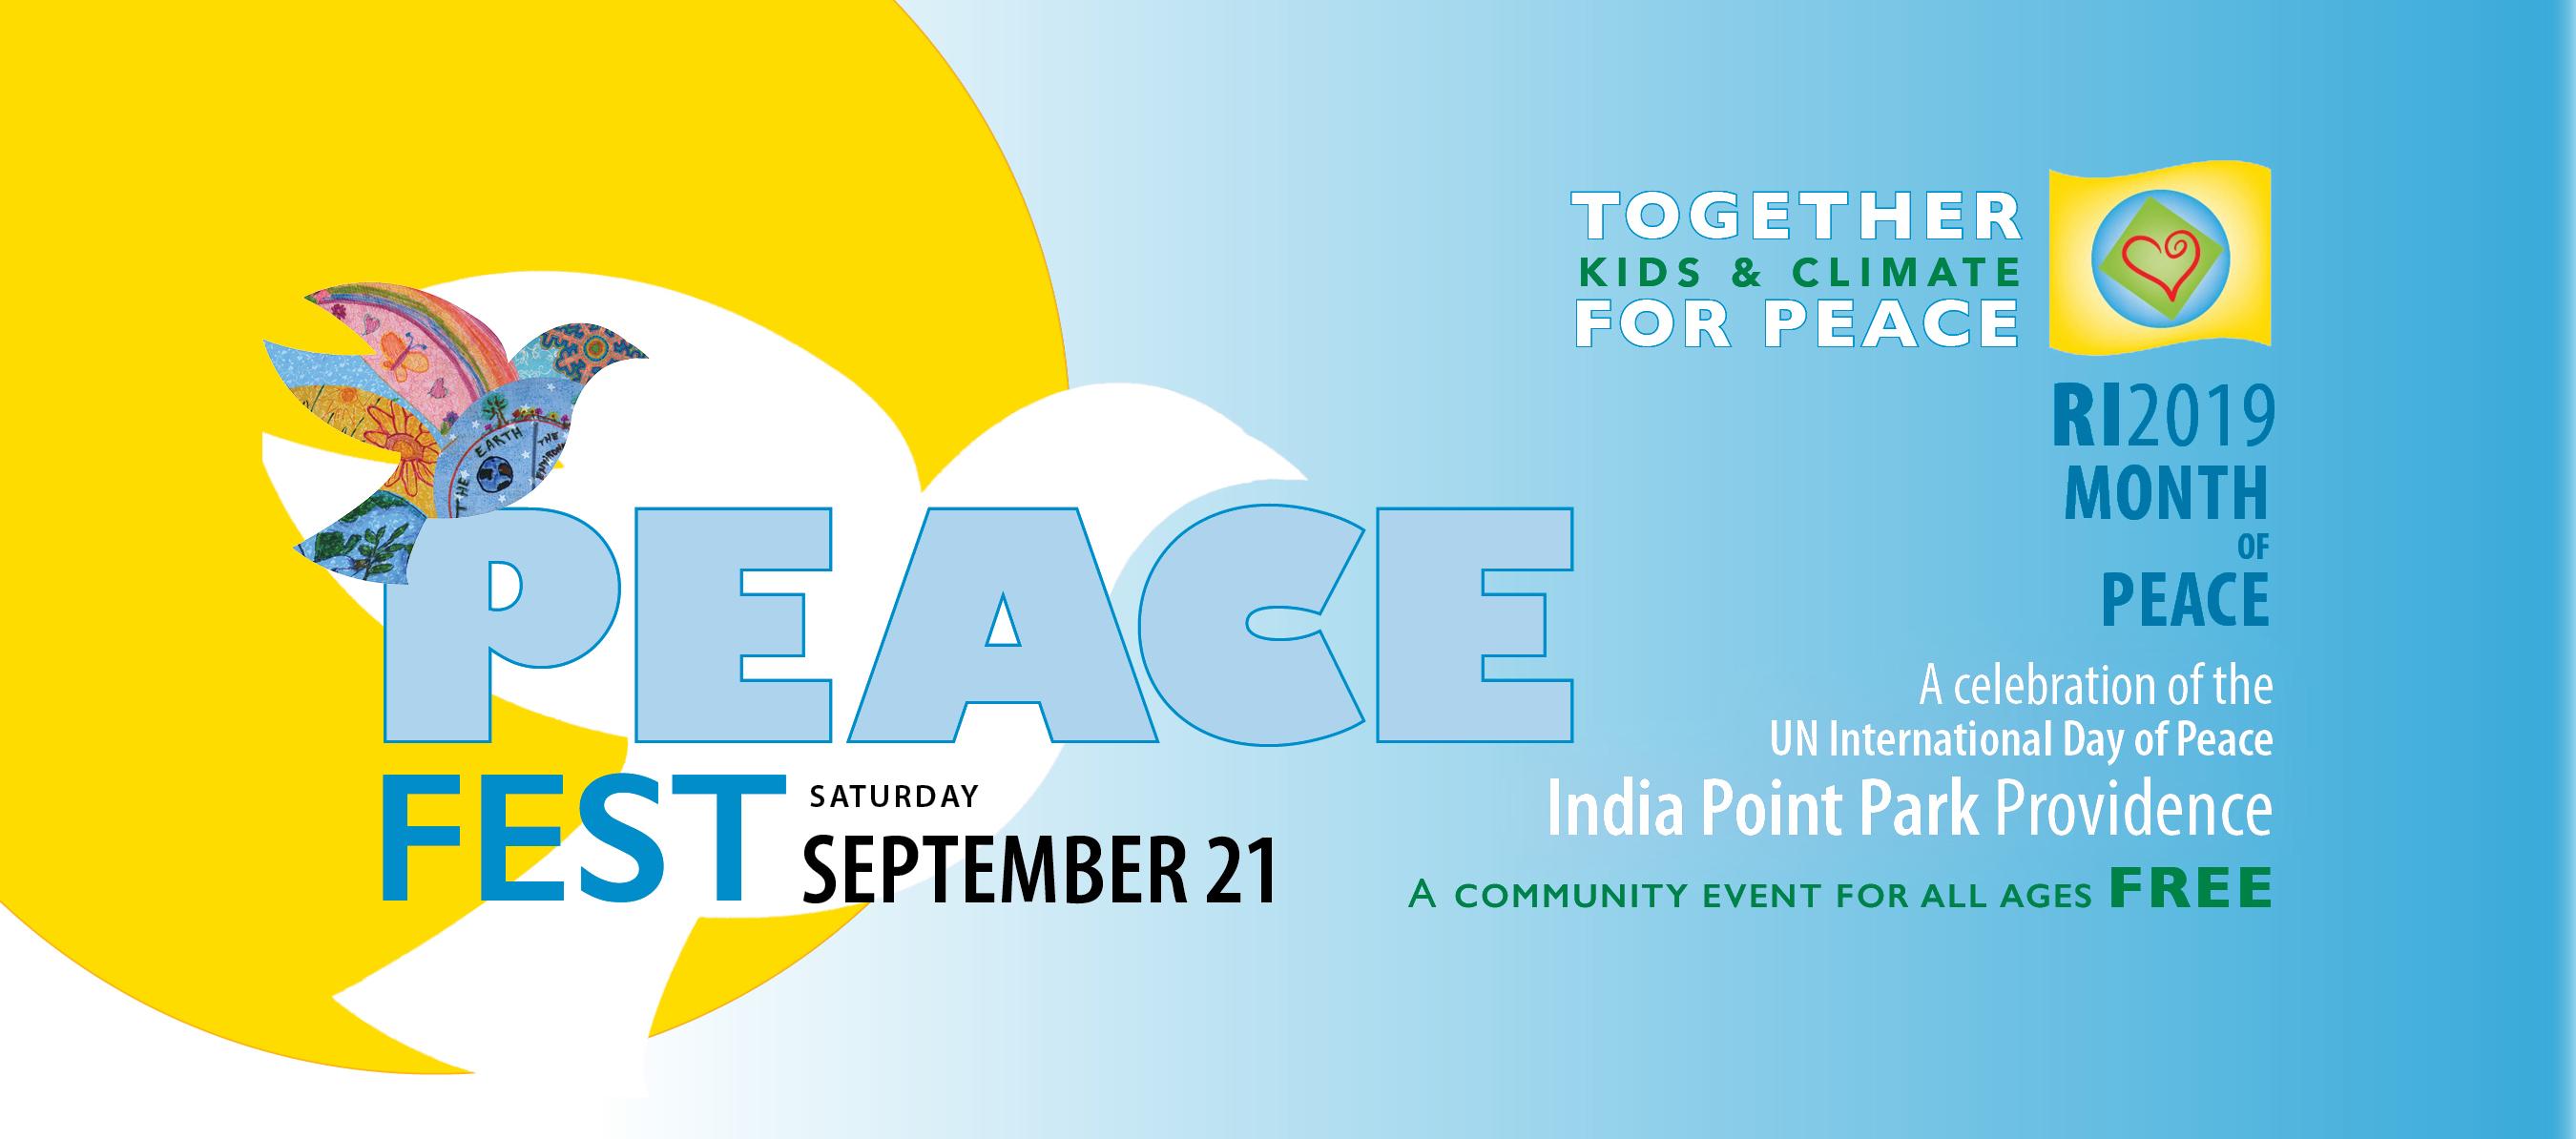 PeaceFest 2019 FBbanner